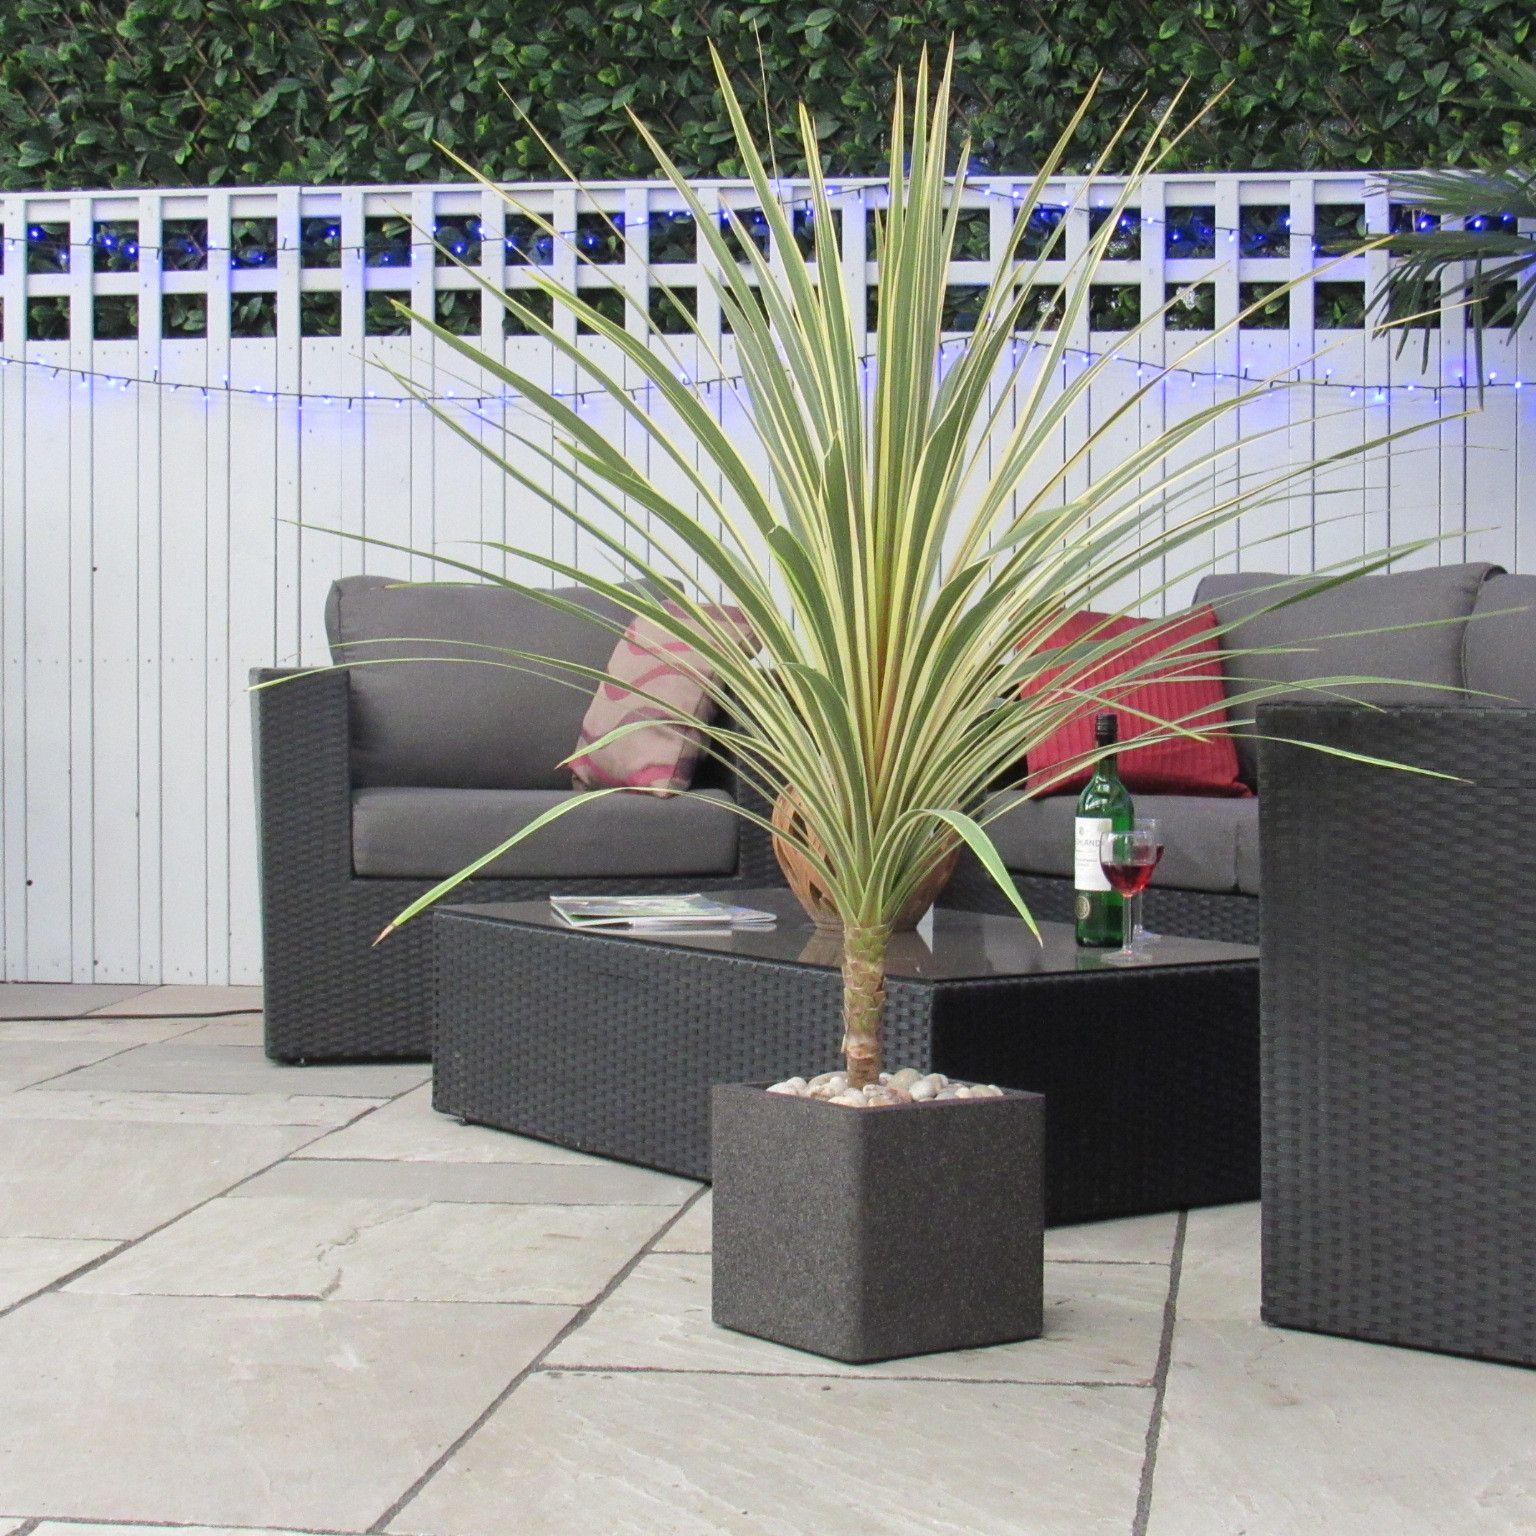 Large Cordyline Australis Torbay Dazzler Unique Rare Patio Planter Complete As Shown Trees Baytreeweddin Patio Planters Garden Spaces Outdoor Plants